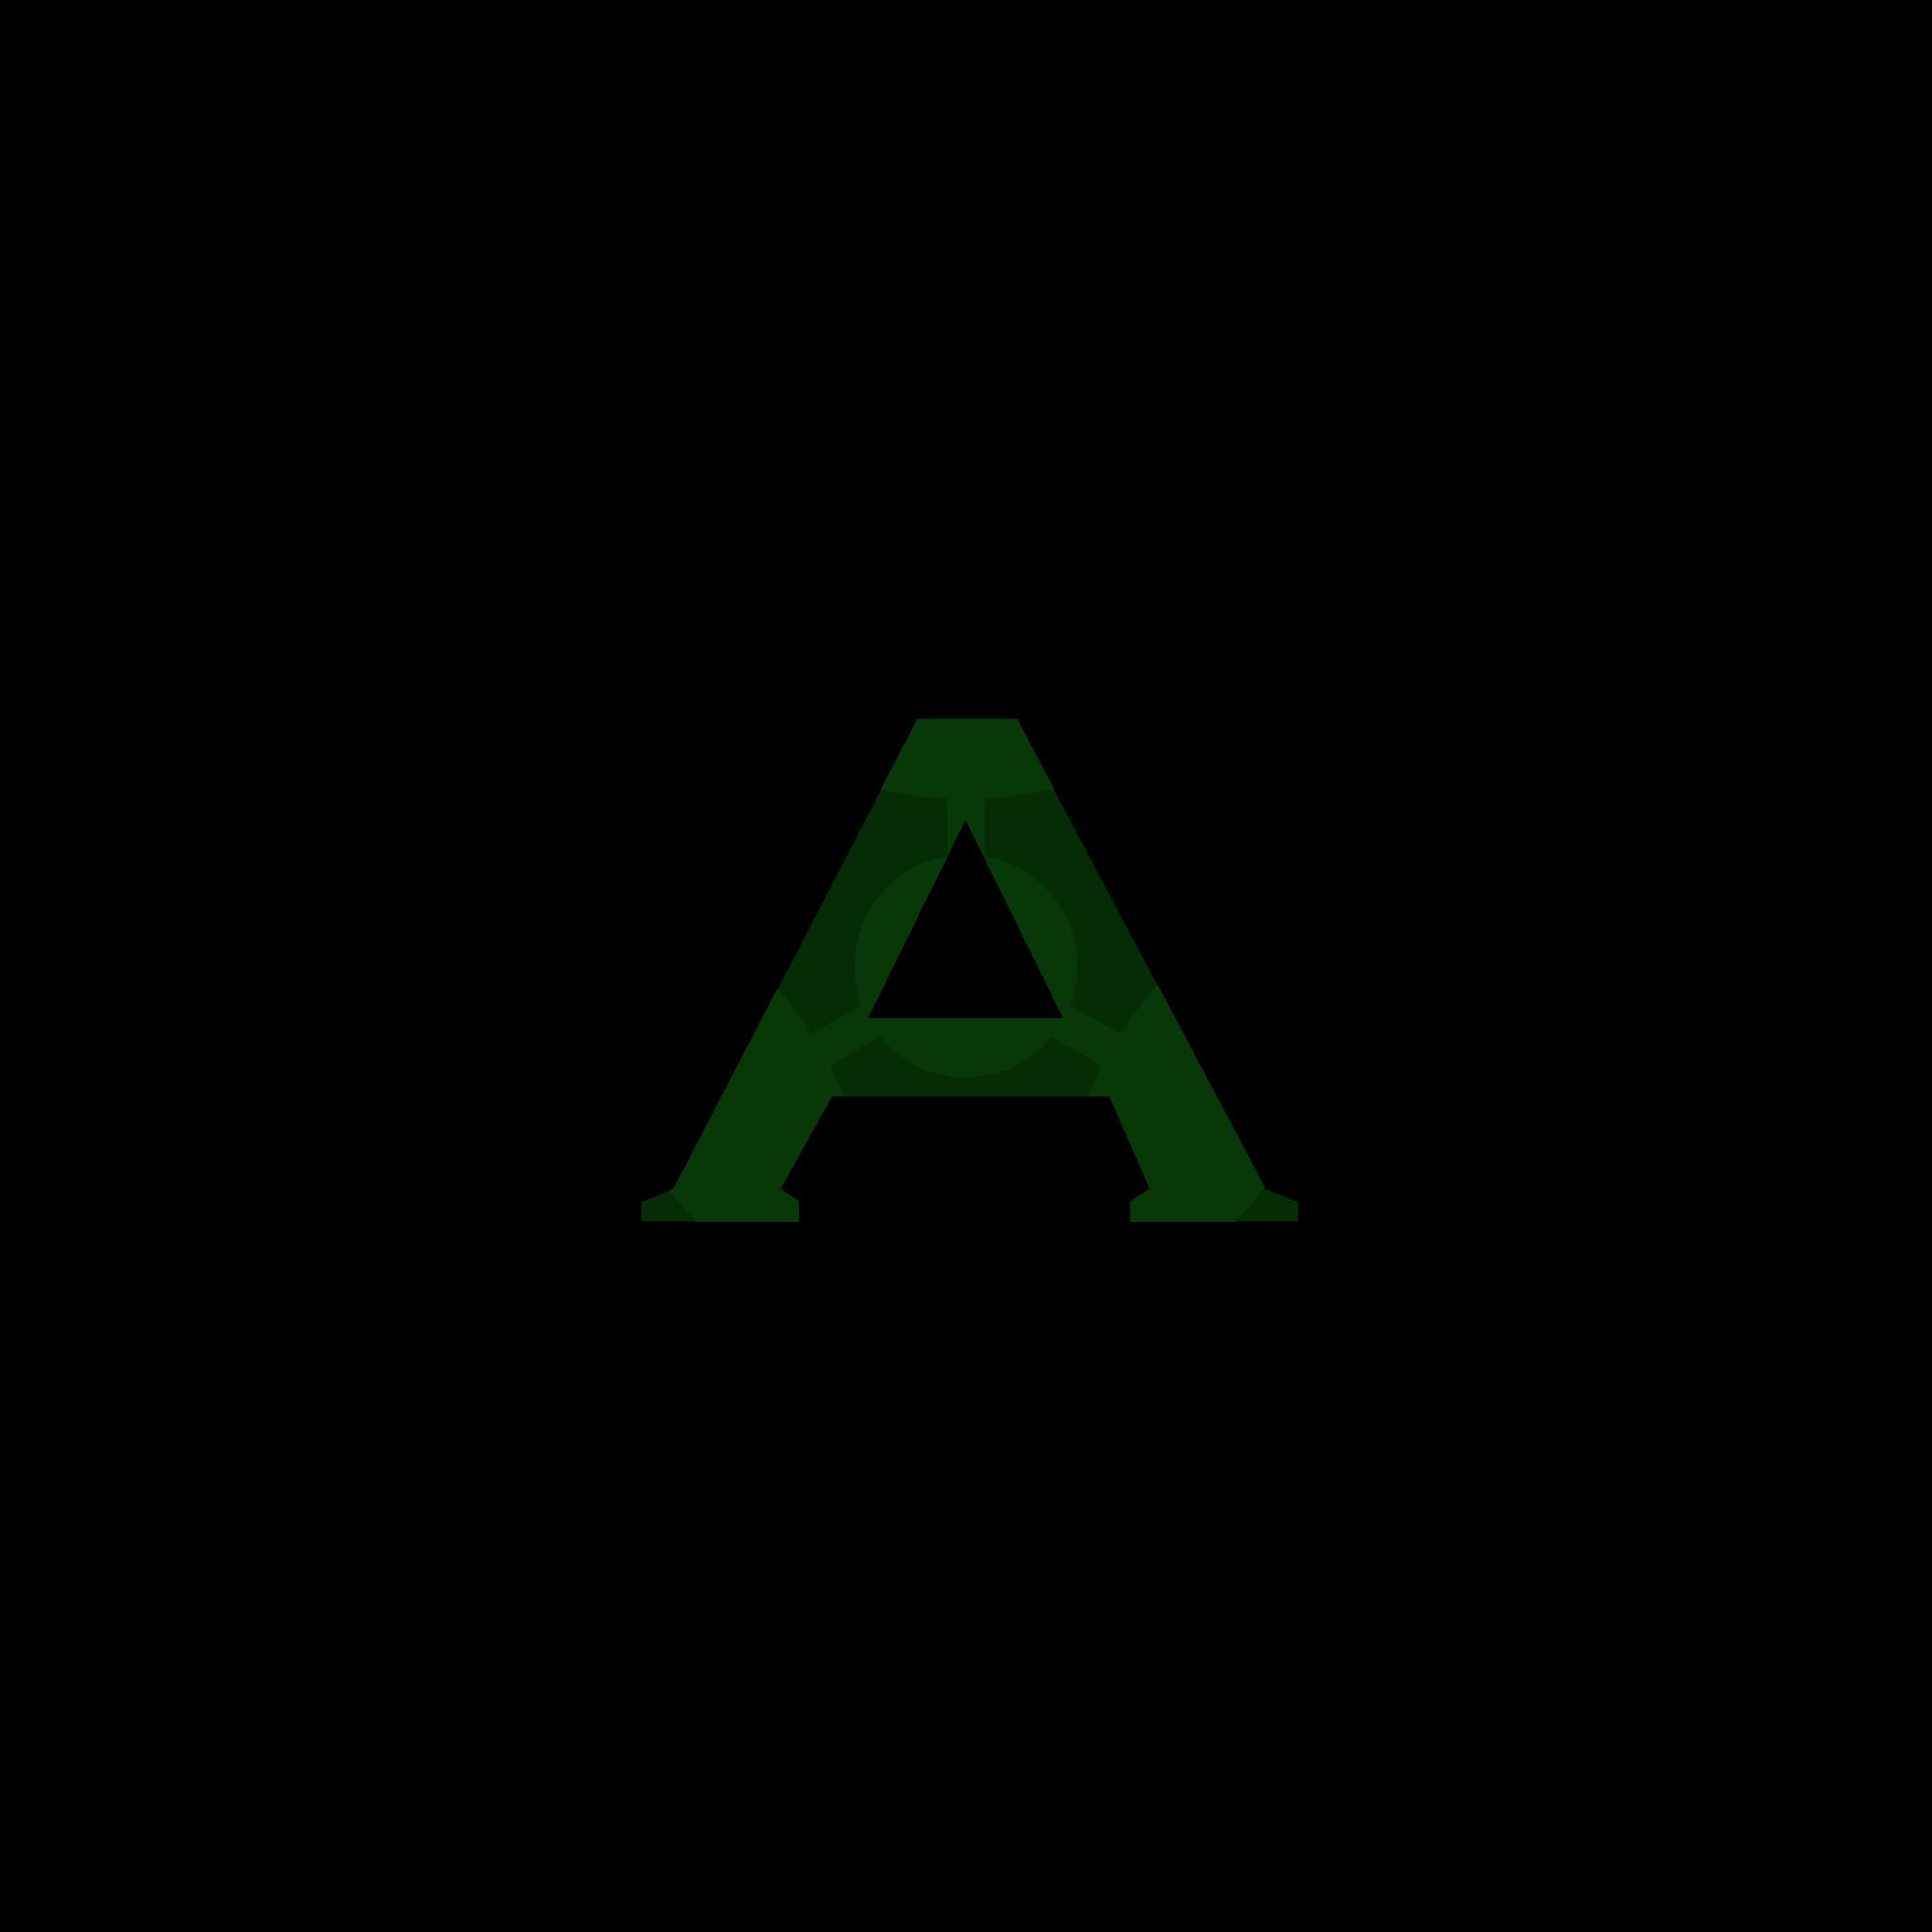 Alpha Radiation Symbol Free Image